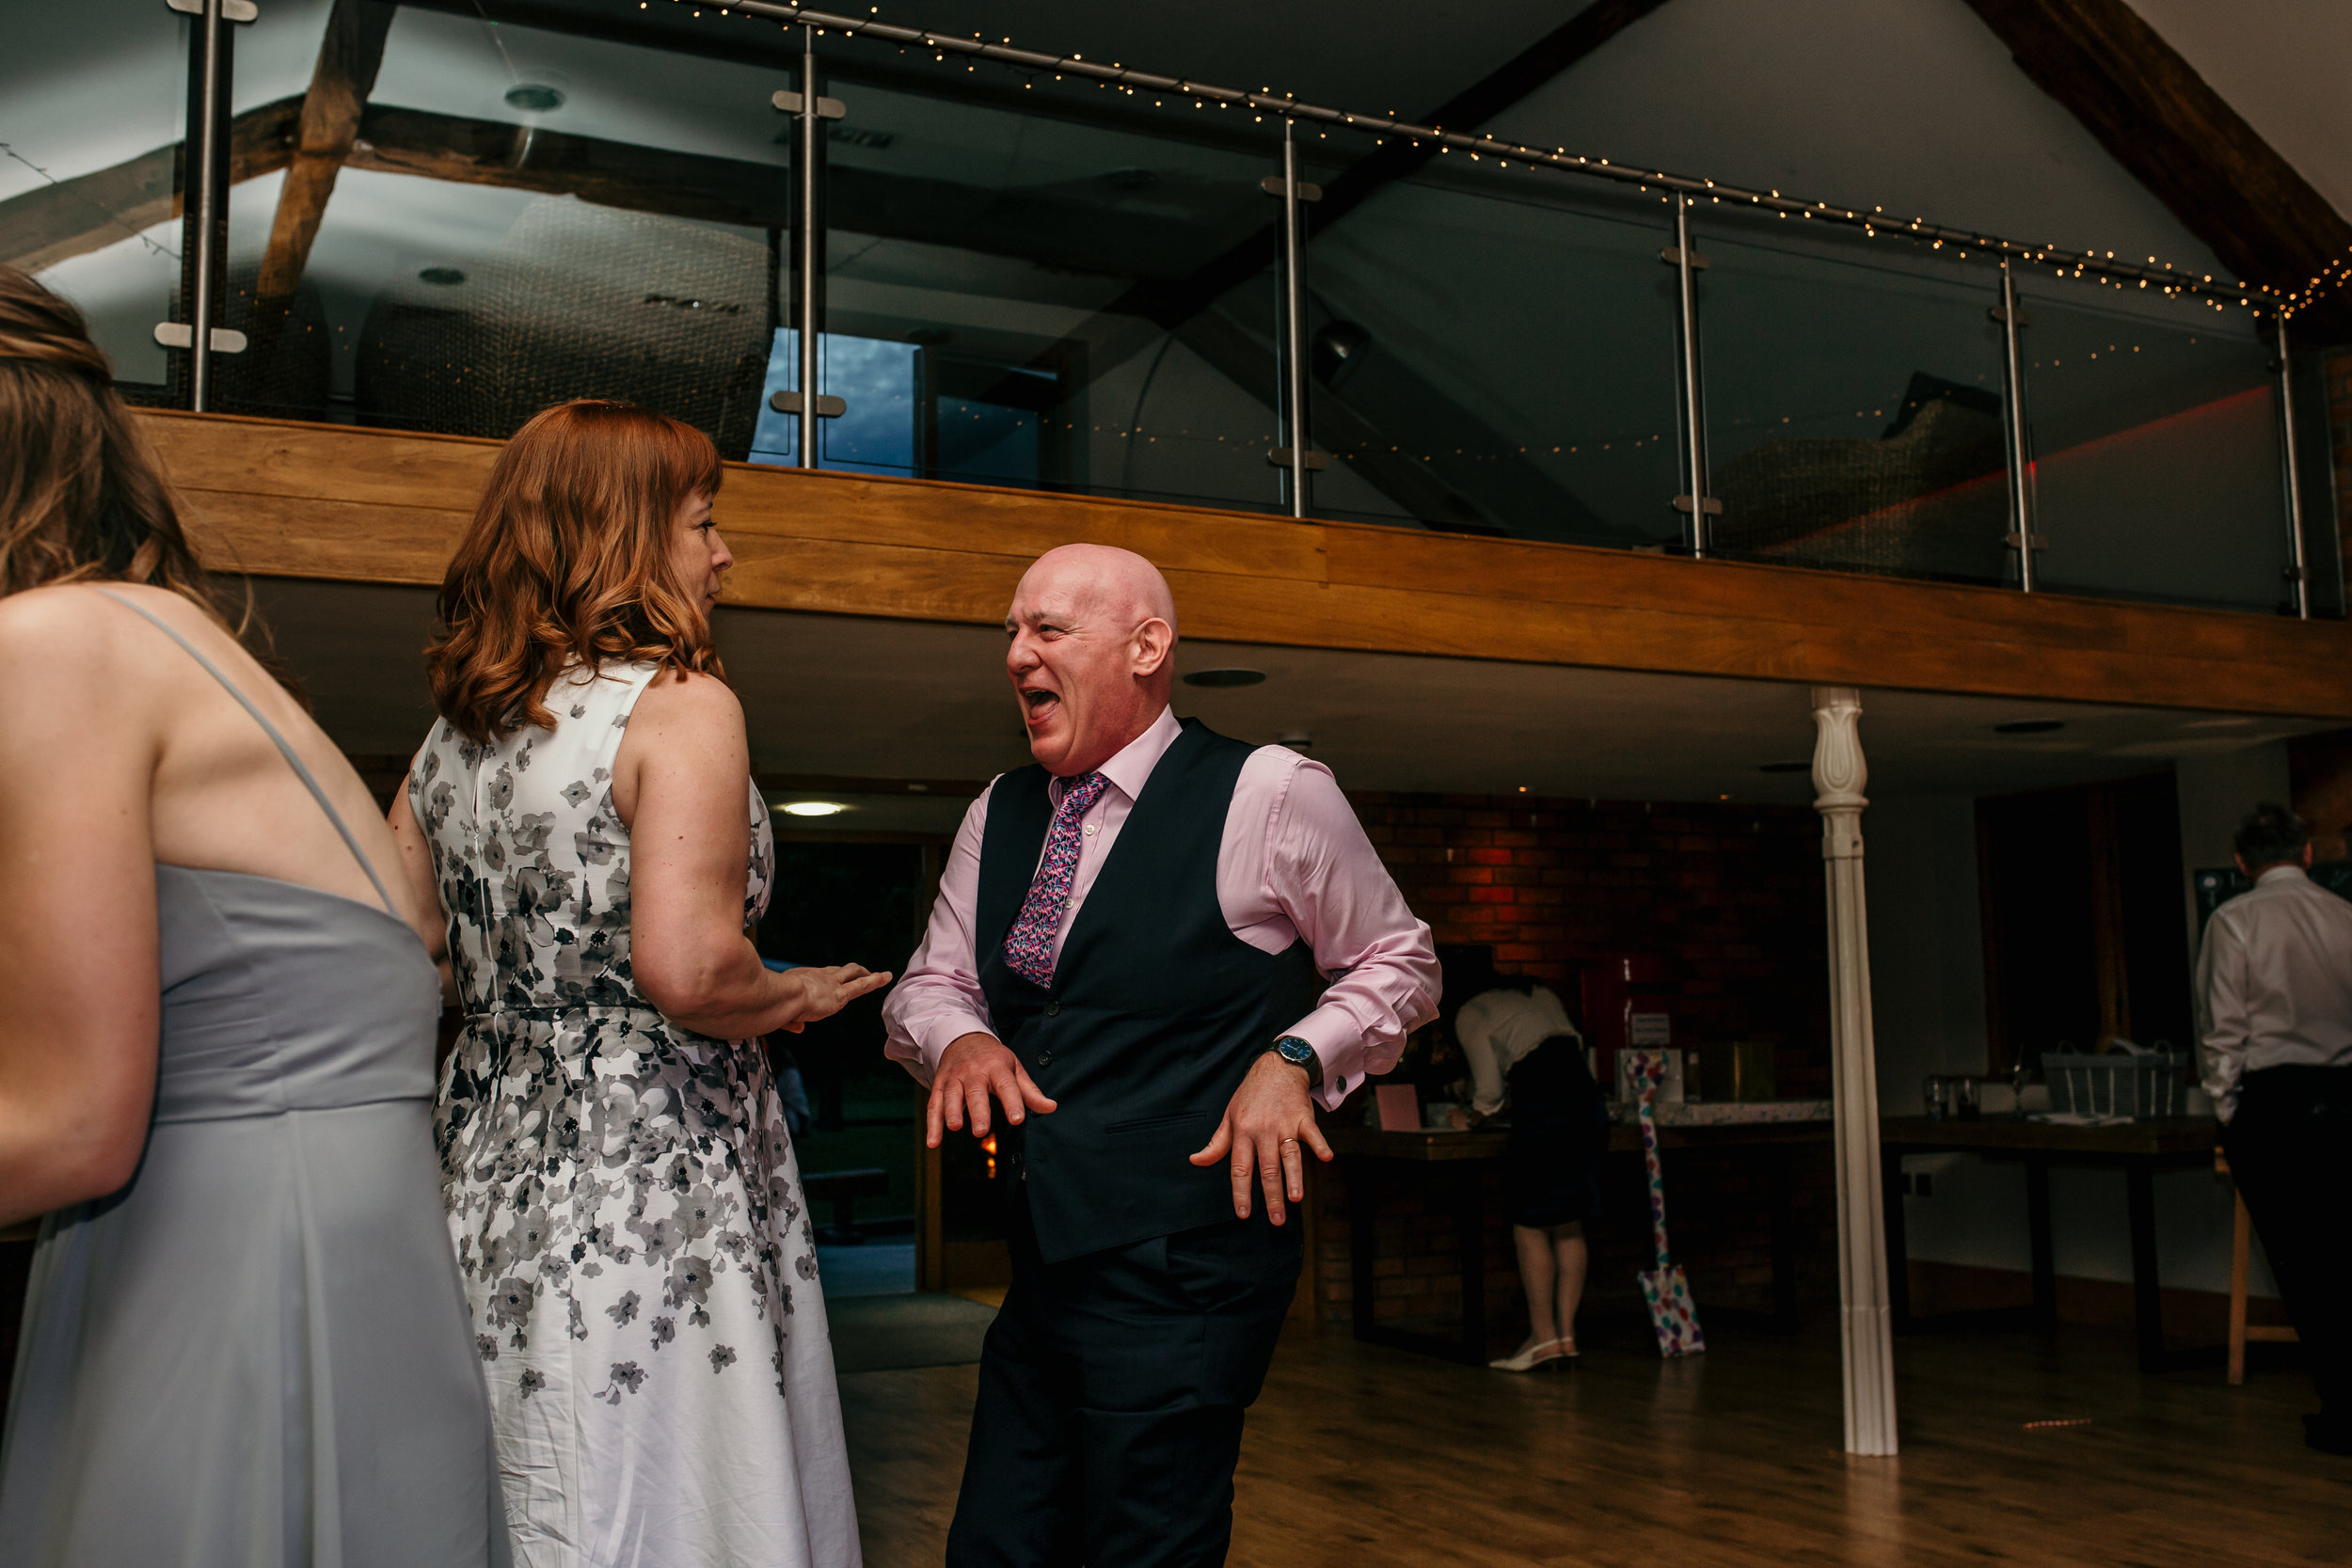 THOMAS WEDDING-205503.jpg